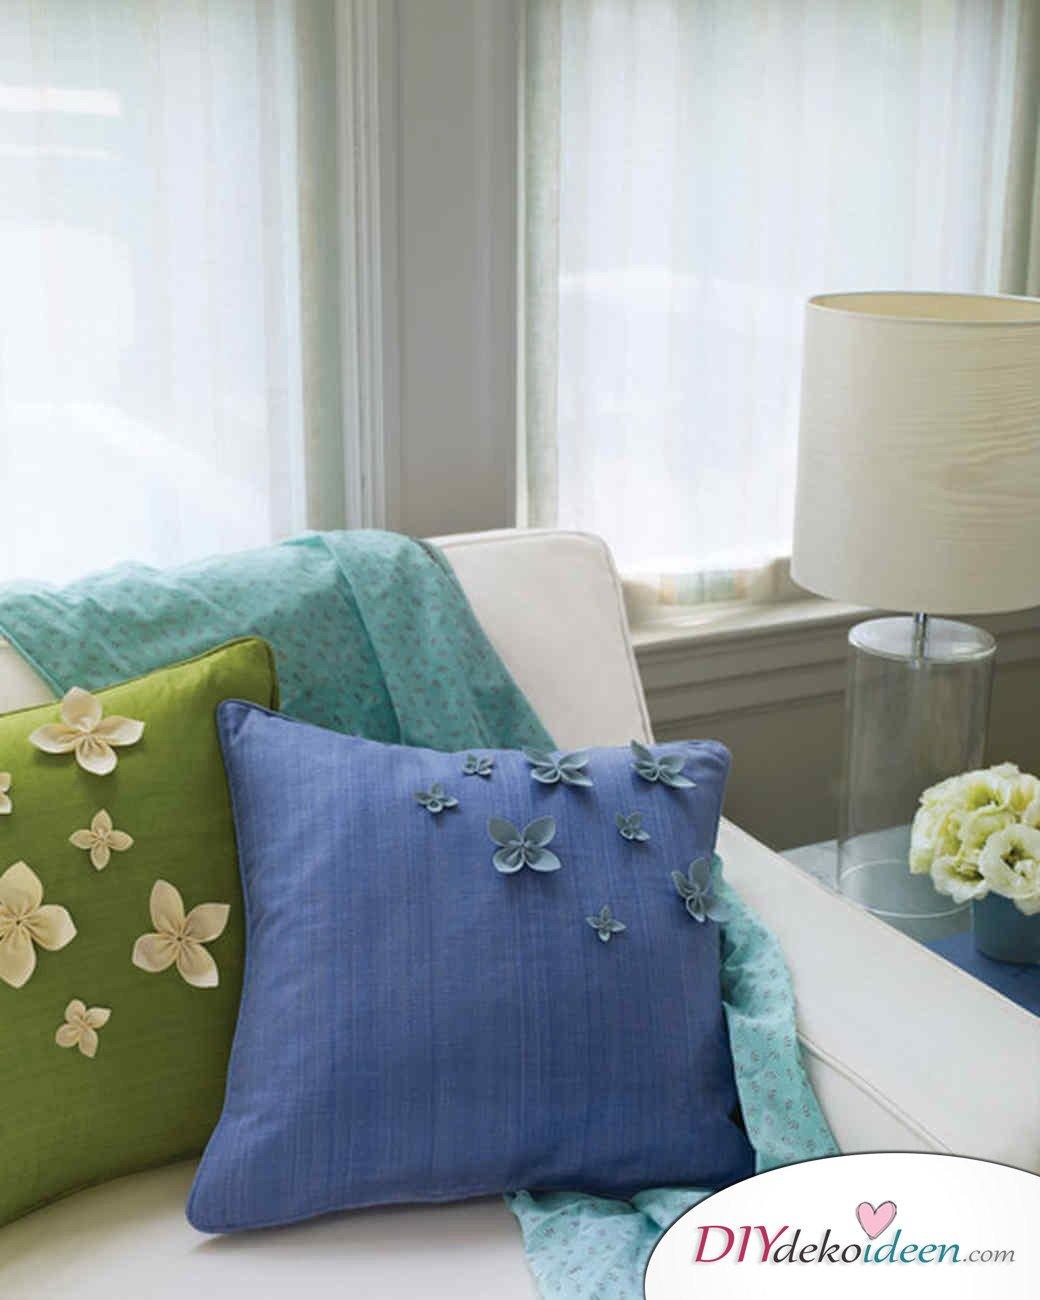 DIY Ideen - Frühlingsdeko selbst gestalten - Kissen mit Blütenblättern